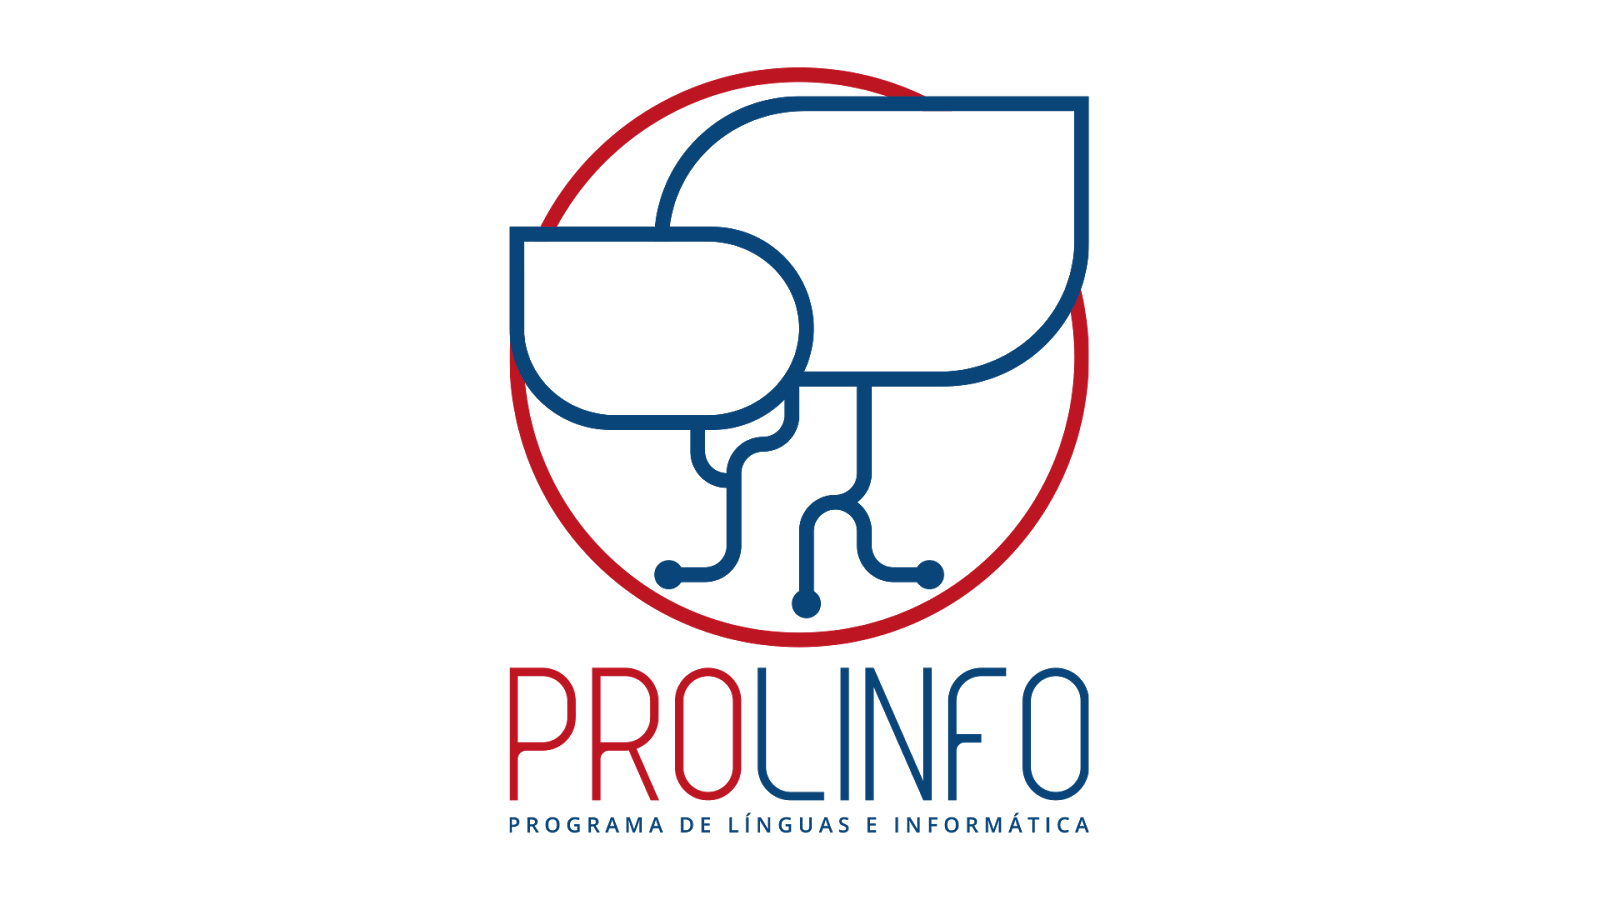 prolinfoo